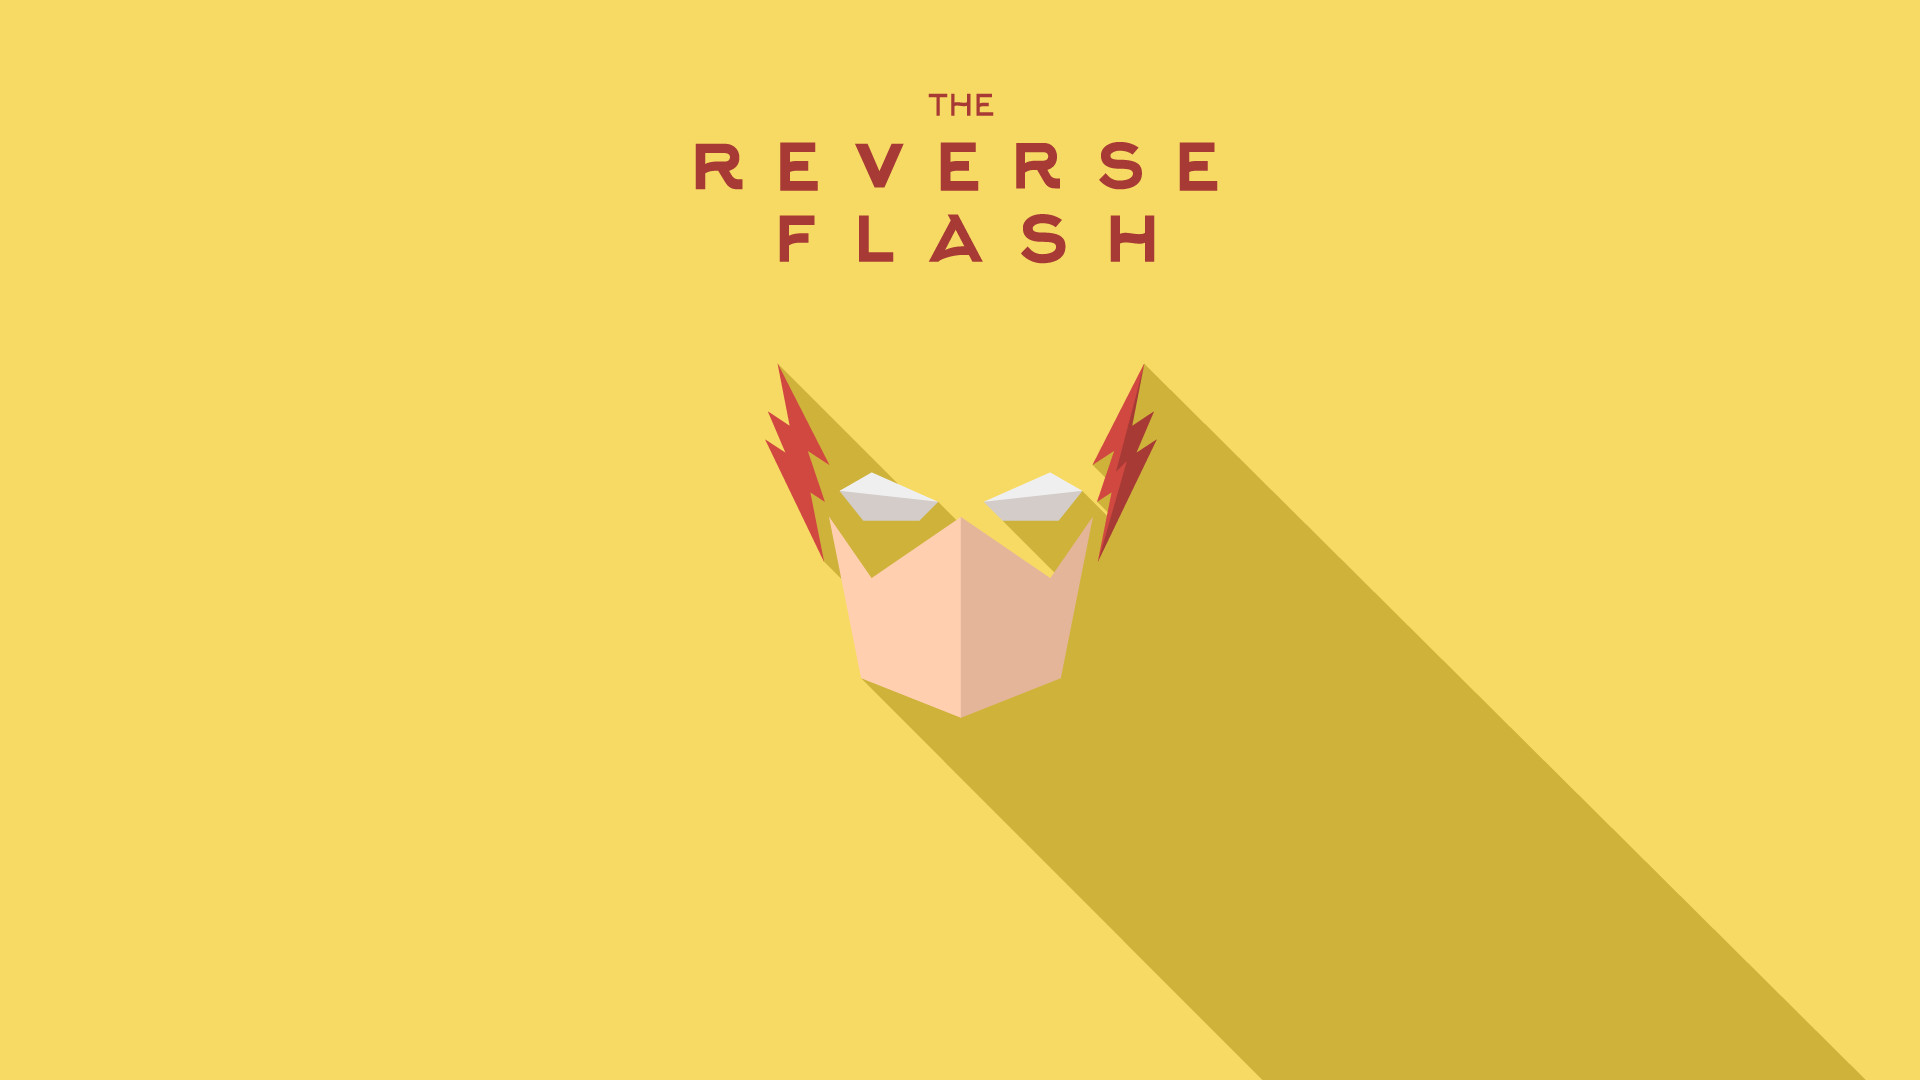 1920x1080 Reverse Flash Logo Wallpaper